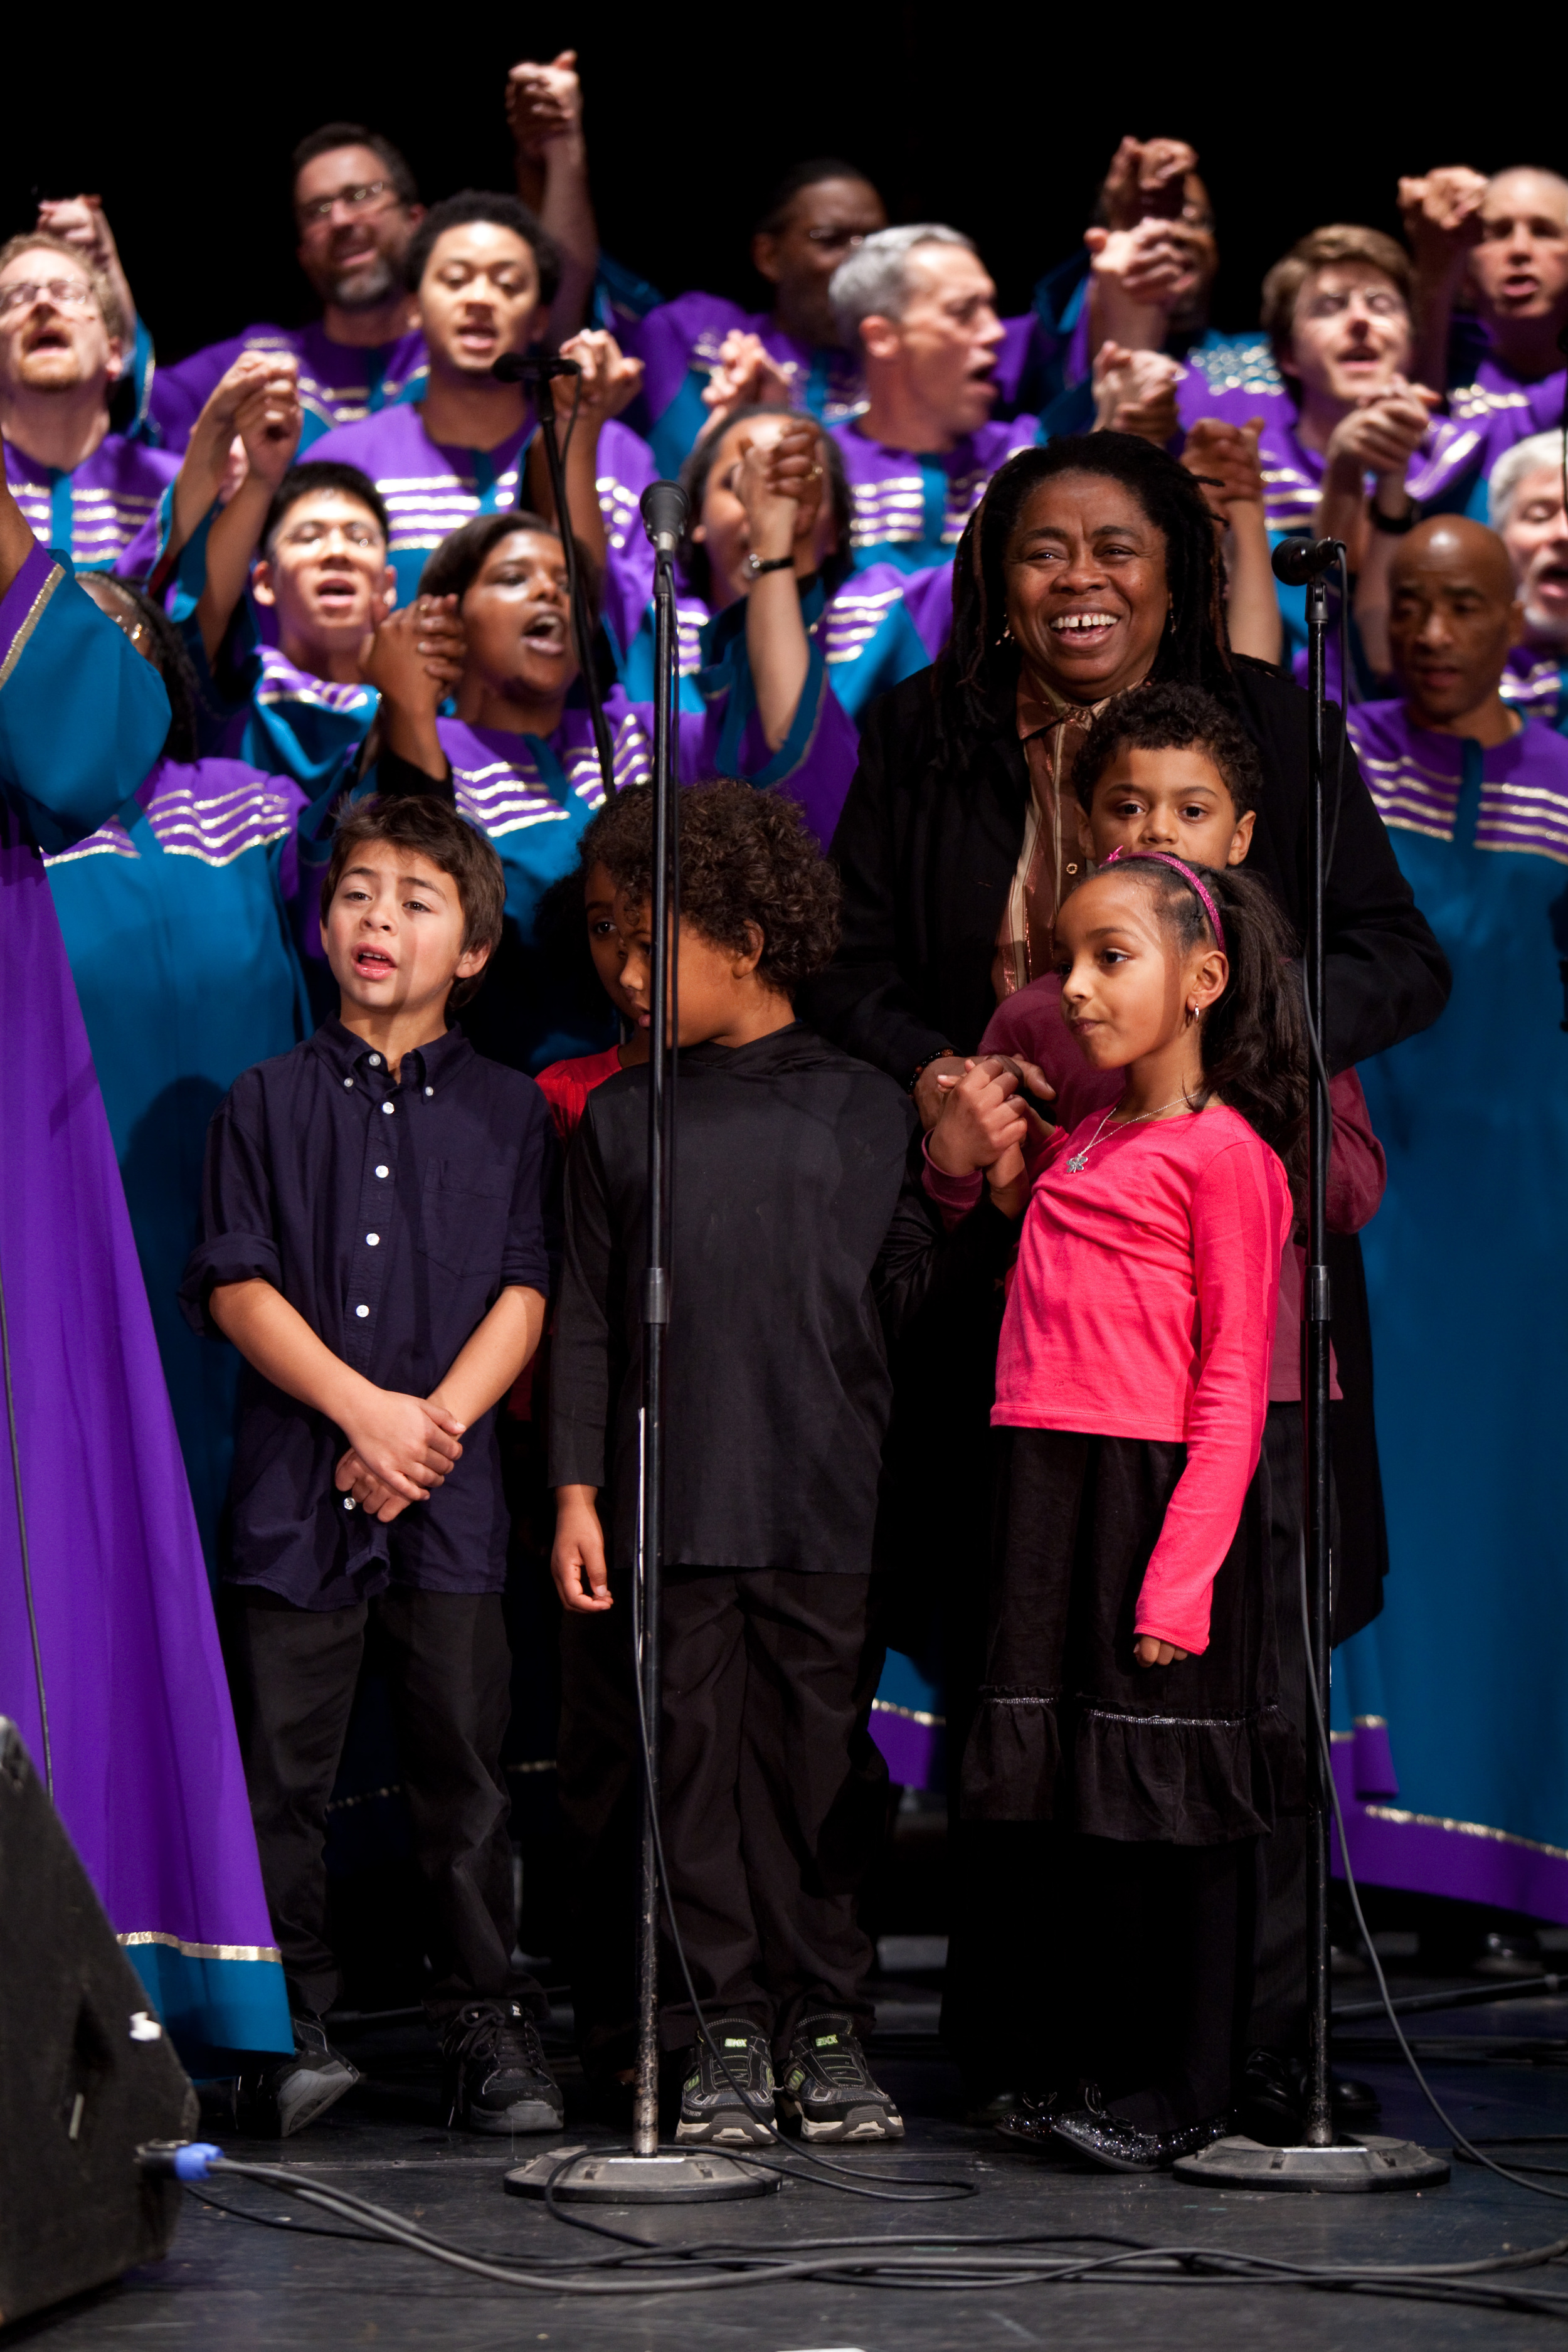 Melanie DeMore & Oakland Interfaith Gospel Choir